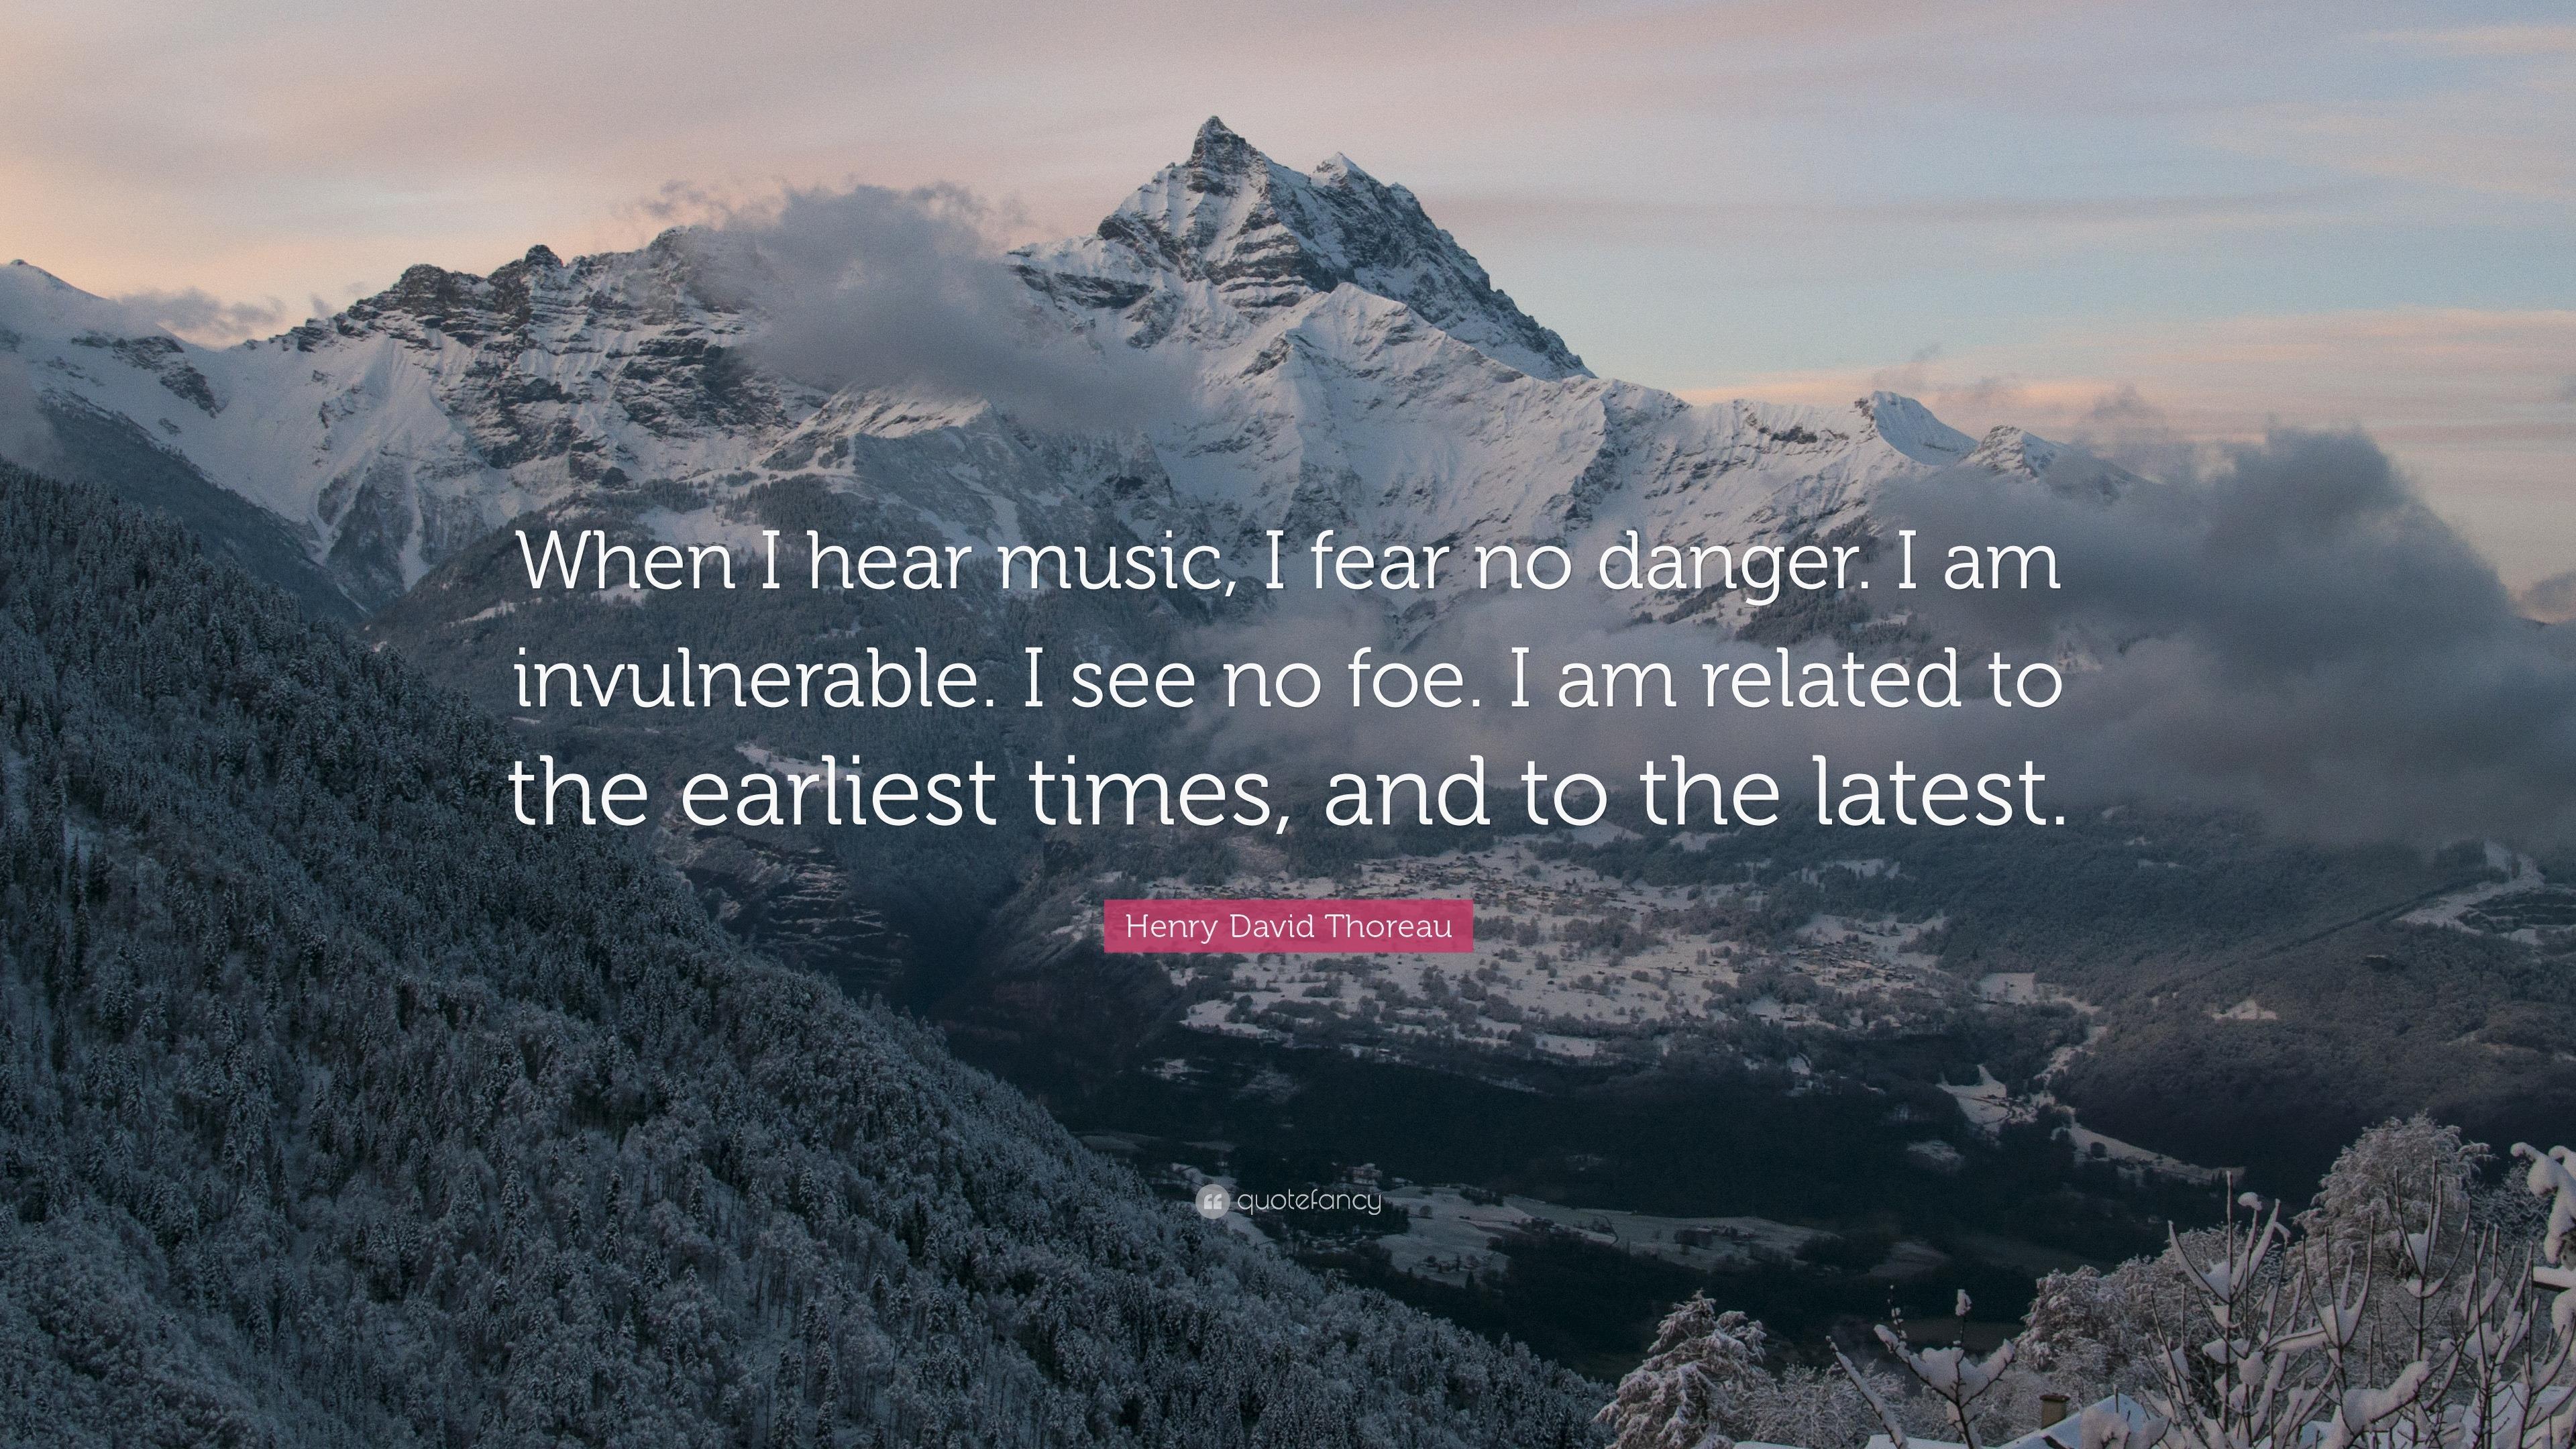 "Henry David Thoreau Quotes Henry David Thoreau Quote: ""When I hear music, I fear no danger. I  Henry David Thoreau Quotes"